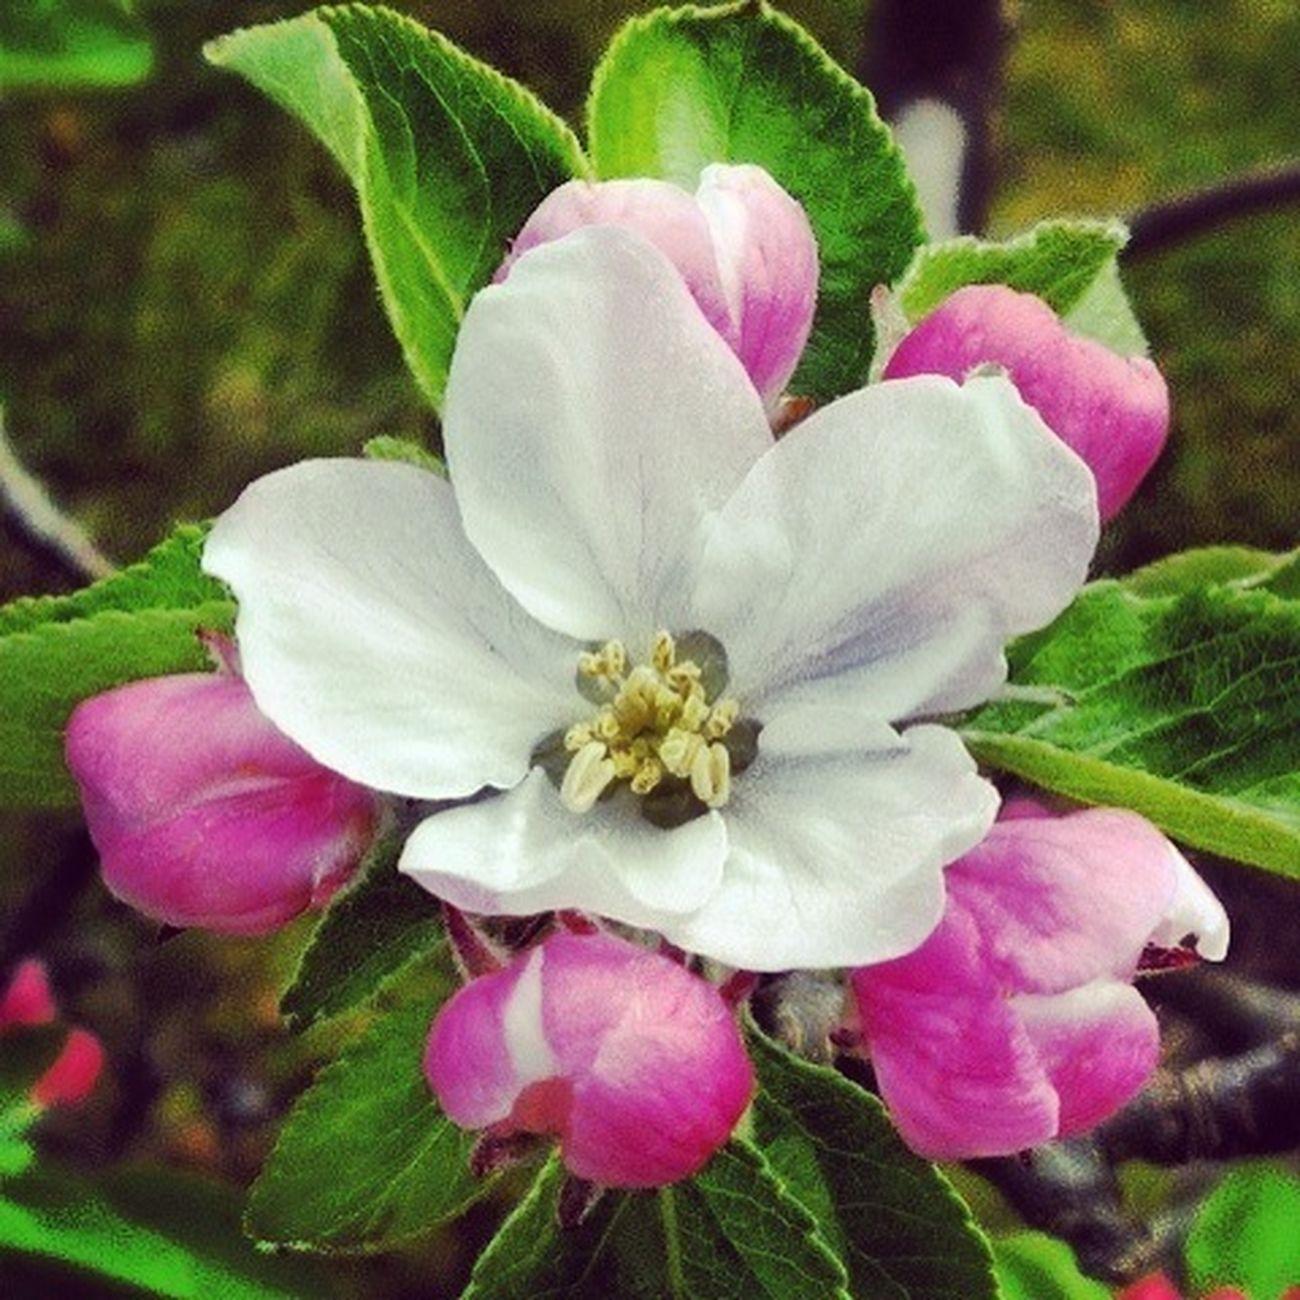 #flower#garden#nature#ecuador#santodomingoecuador#eyeEmfollowers#iphoneonly#nofiltrer#macro_garden#pretty#beautiful#followme#shooters#sun#sky#hojas#eyeEm#macro#eyeEmaddictic#daily#picoftheday#photooftheday#bestflower#bestshoot